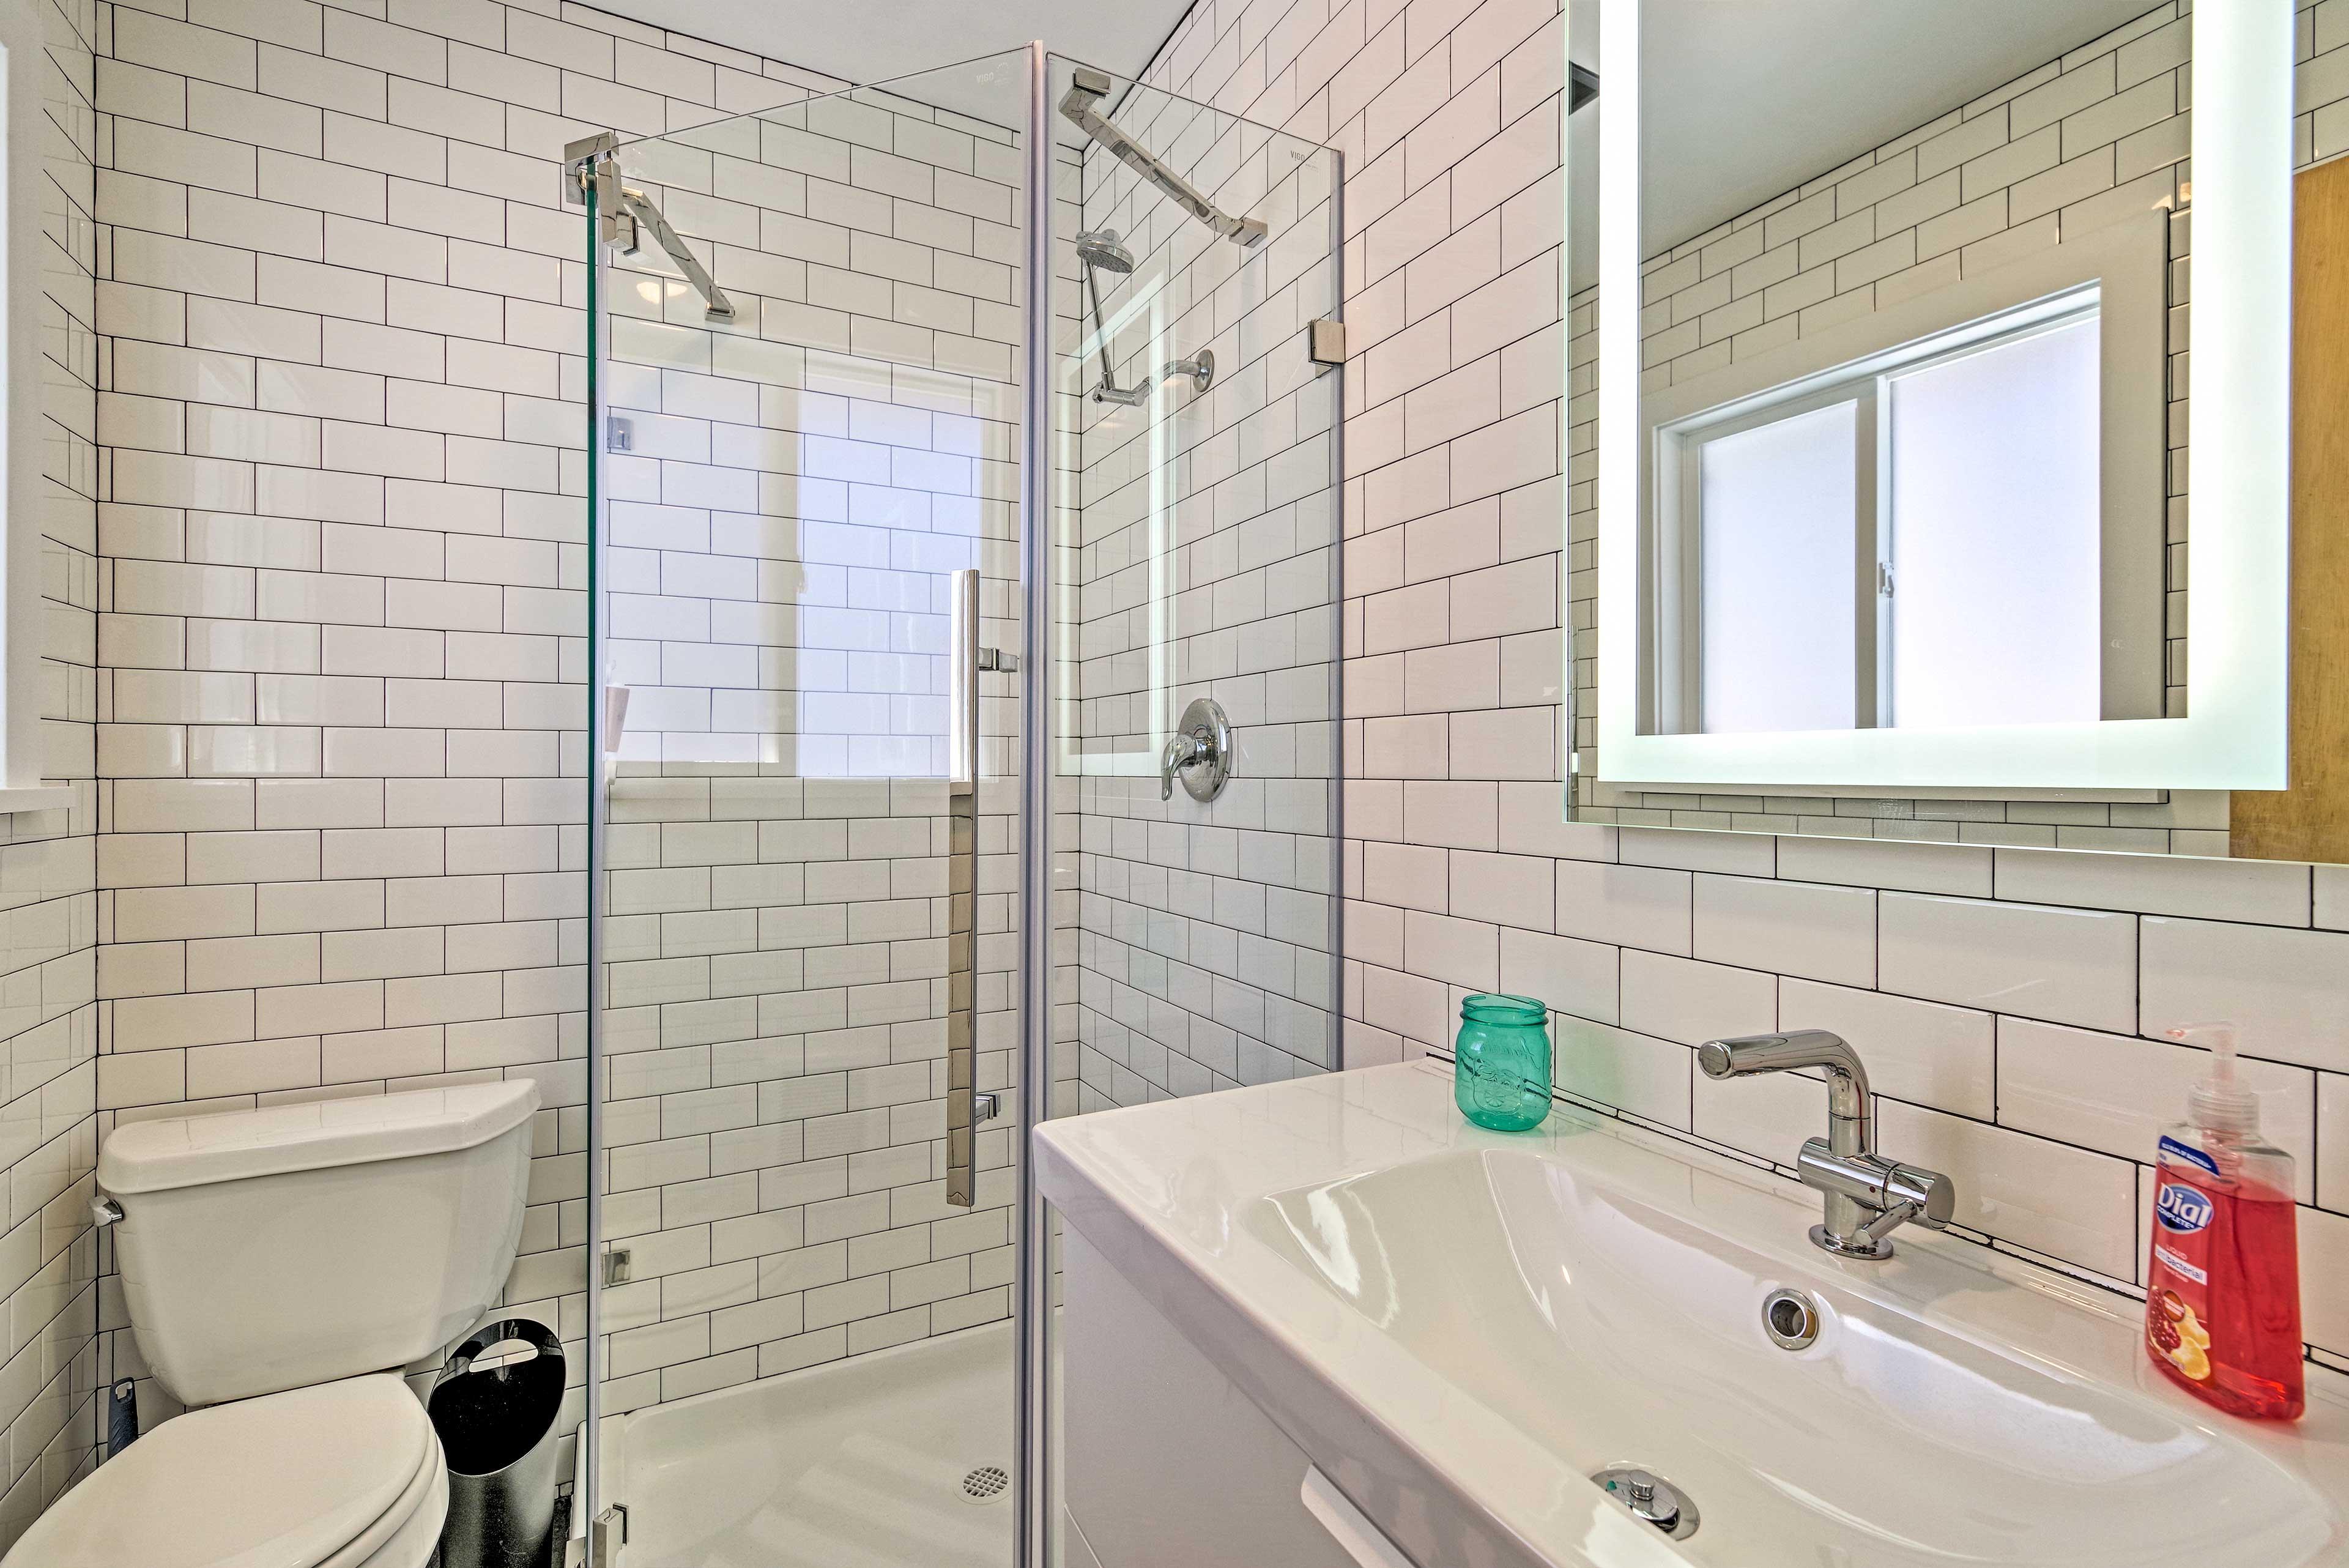 The en-suite features a walk-in shower.